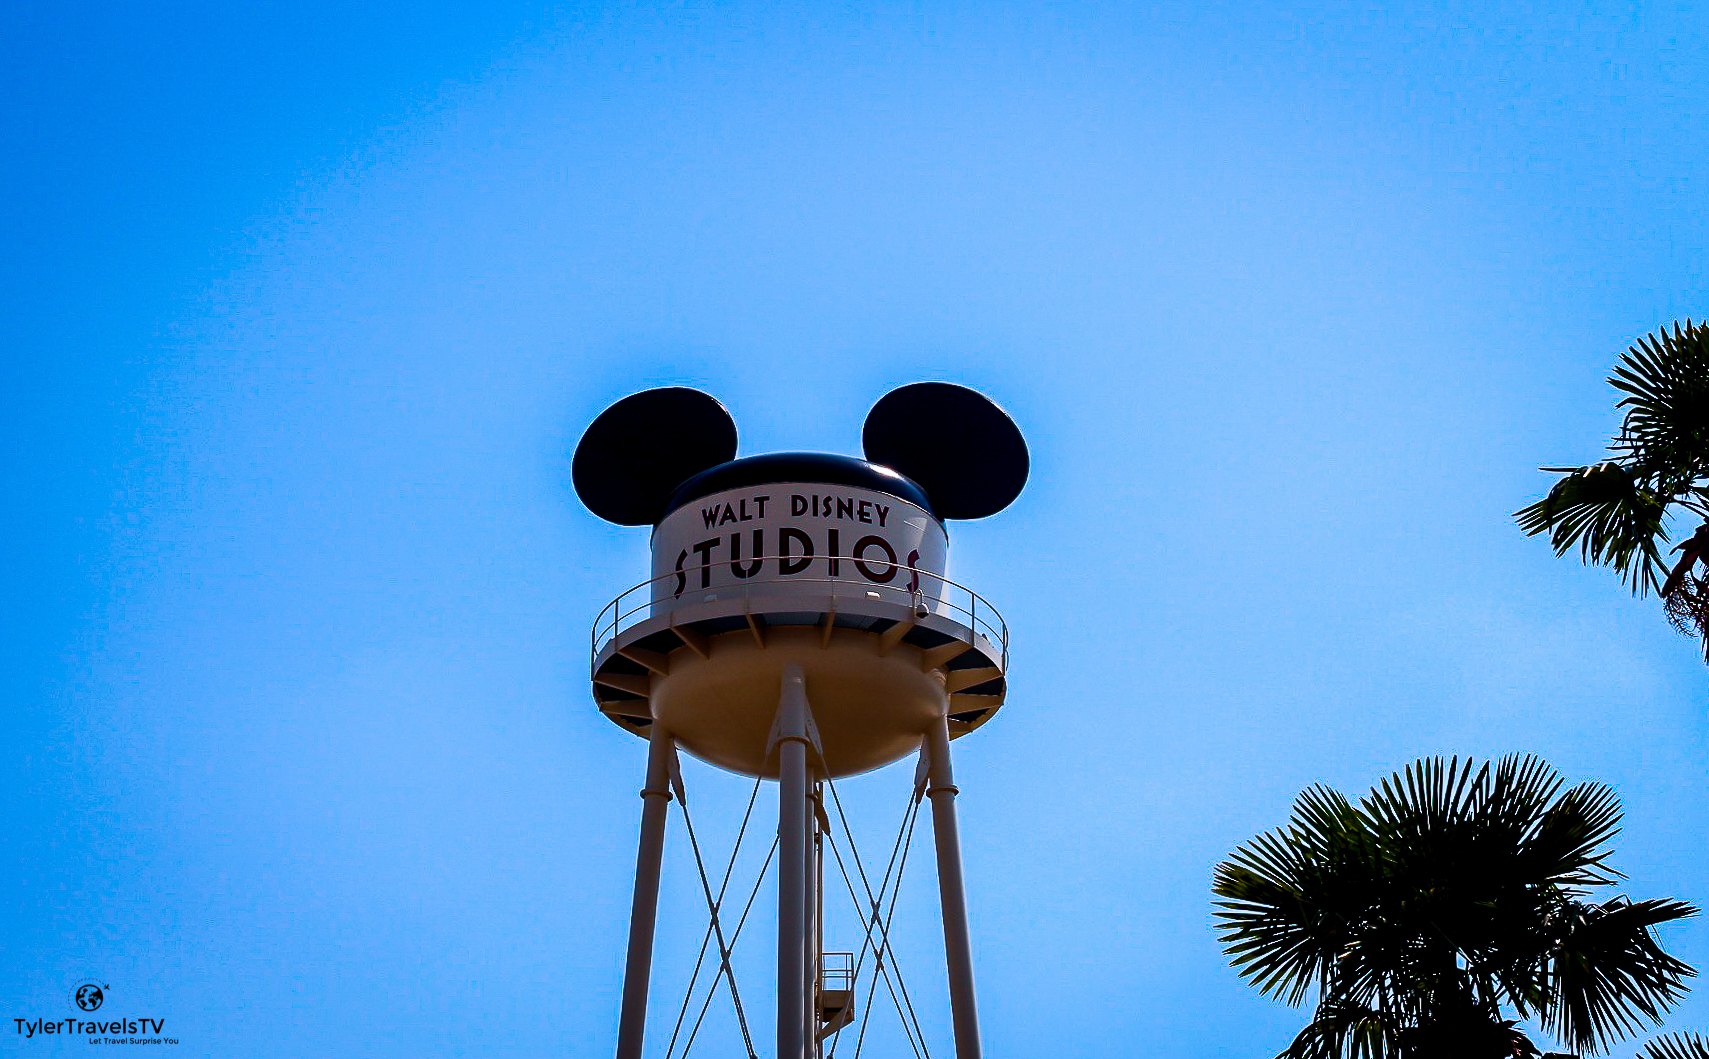 Disney Stock Photo-3.jpg